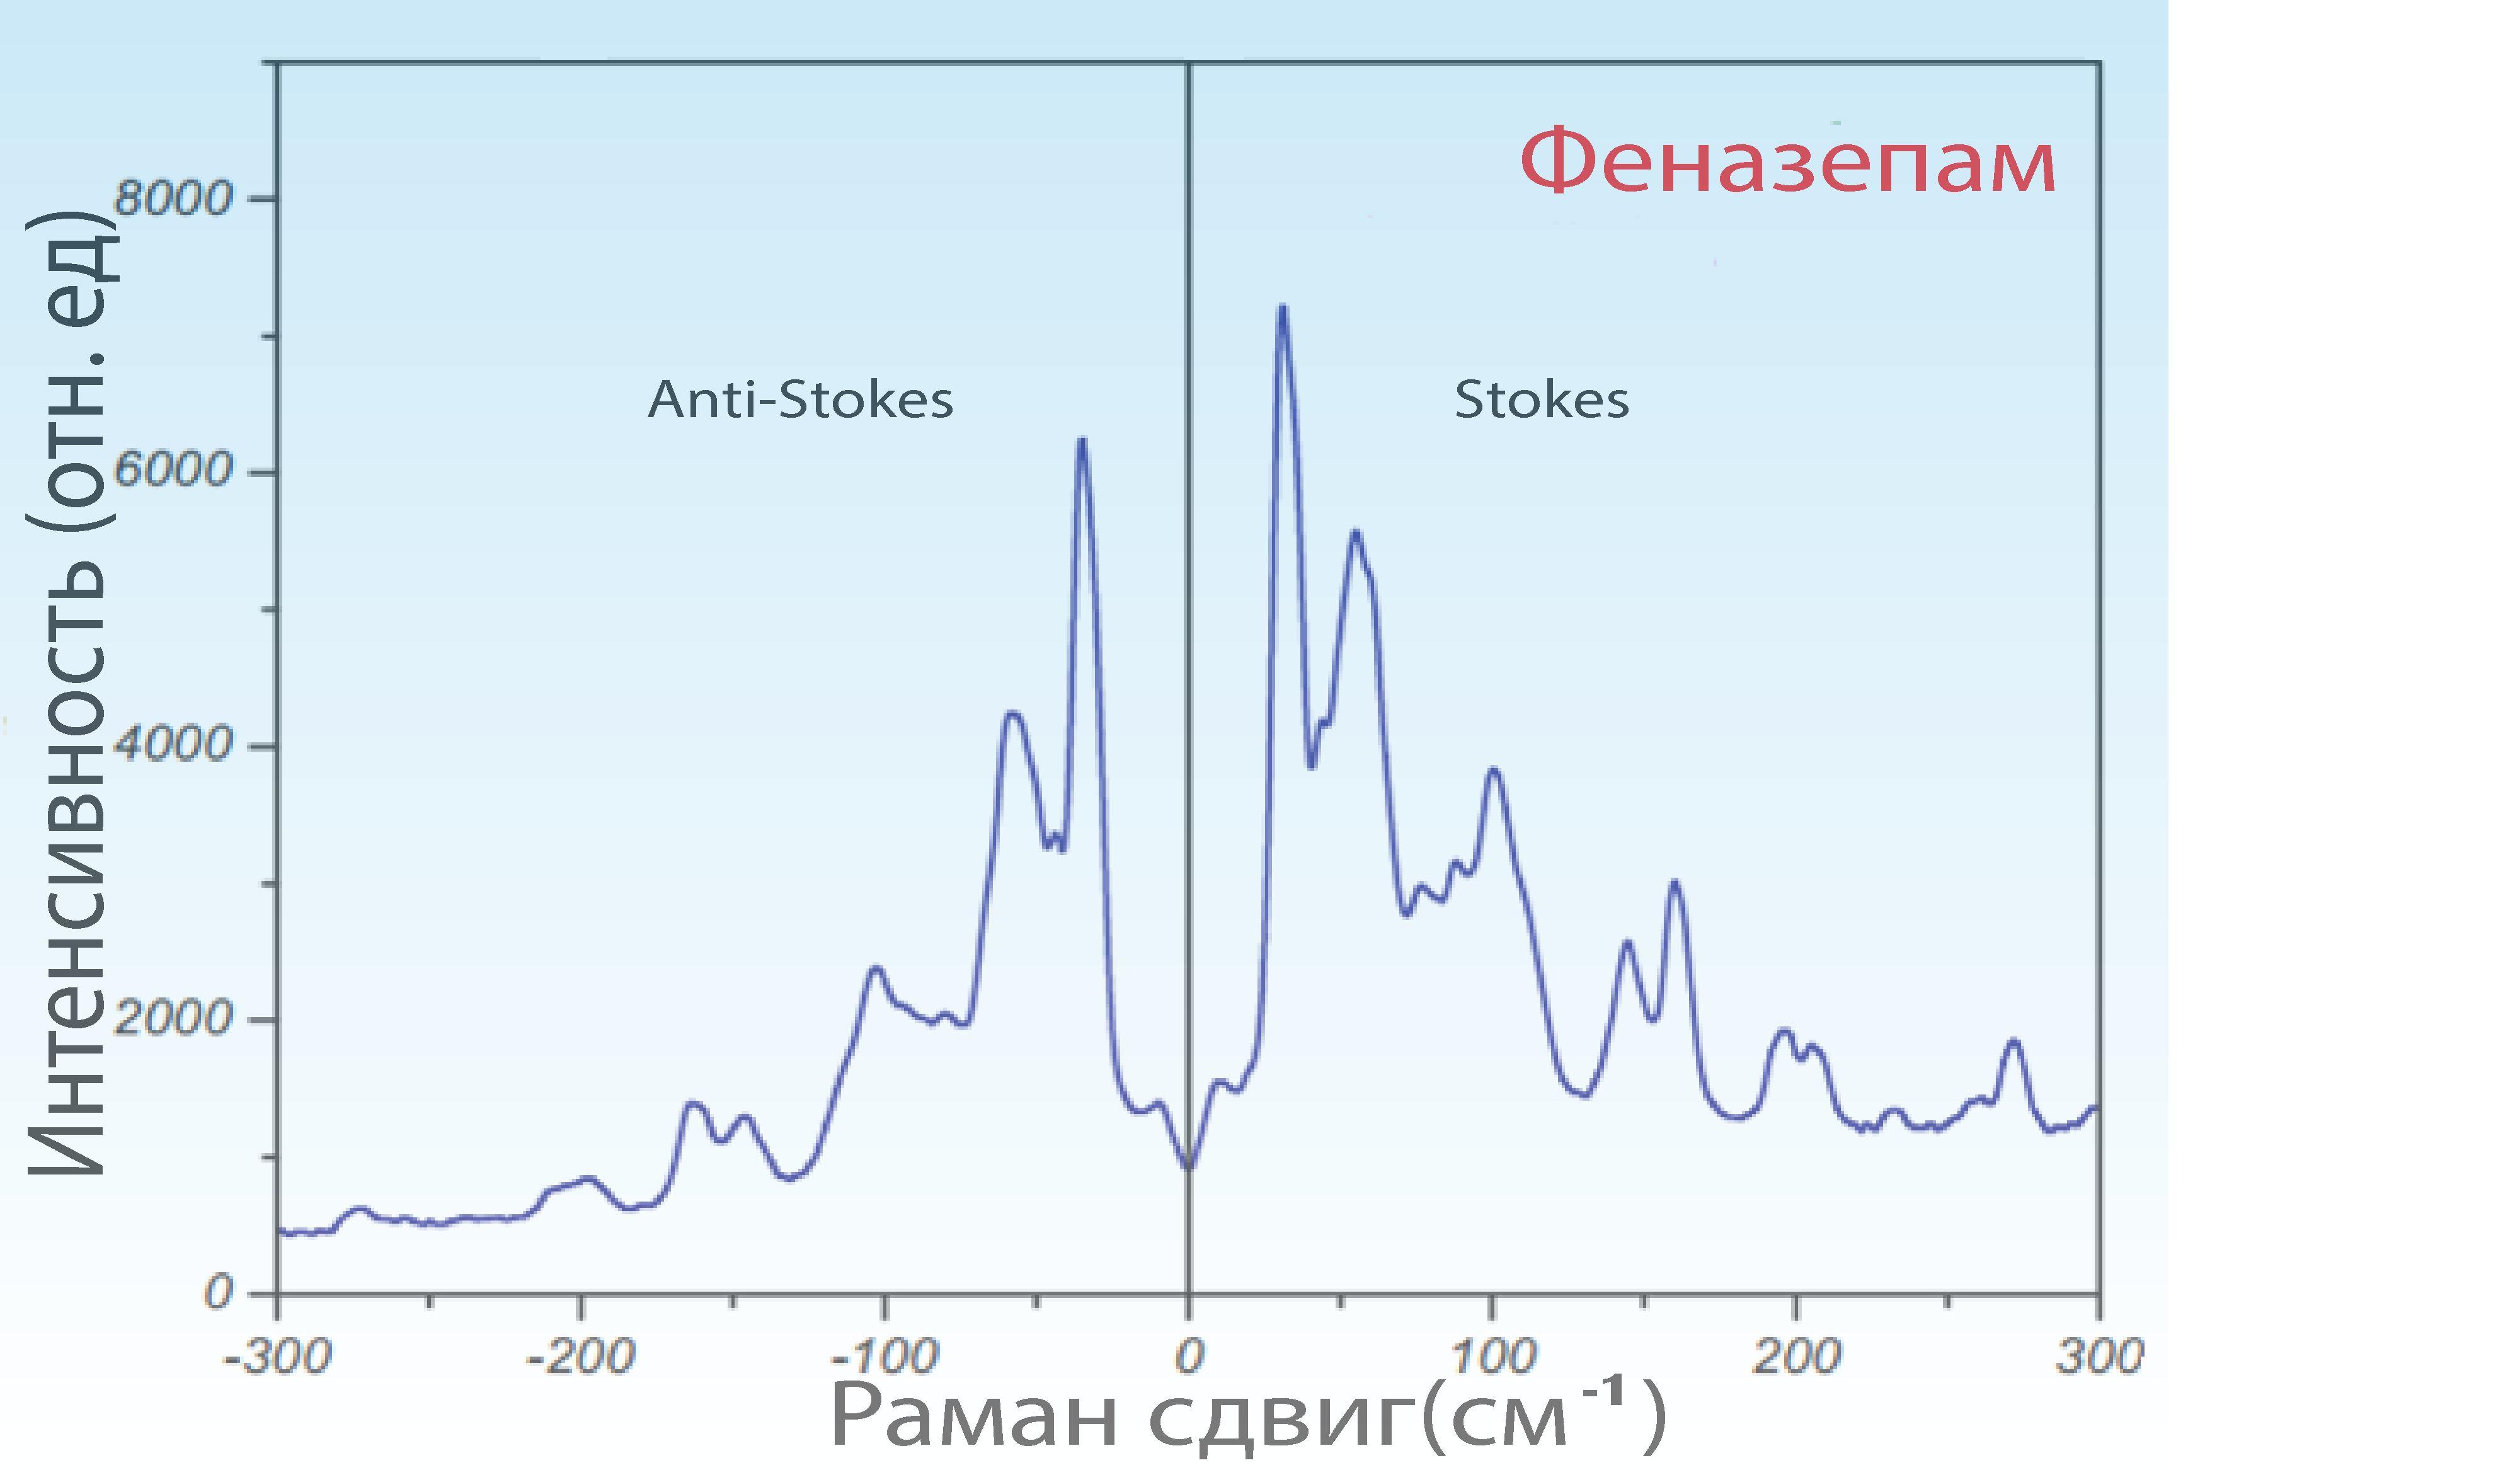 phenazepam